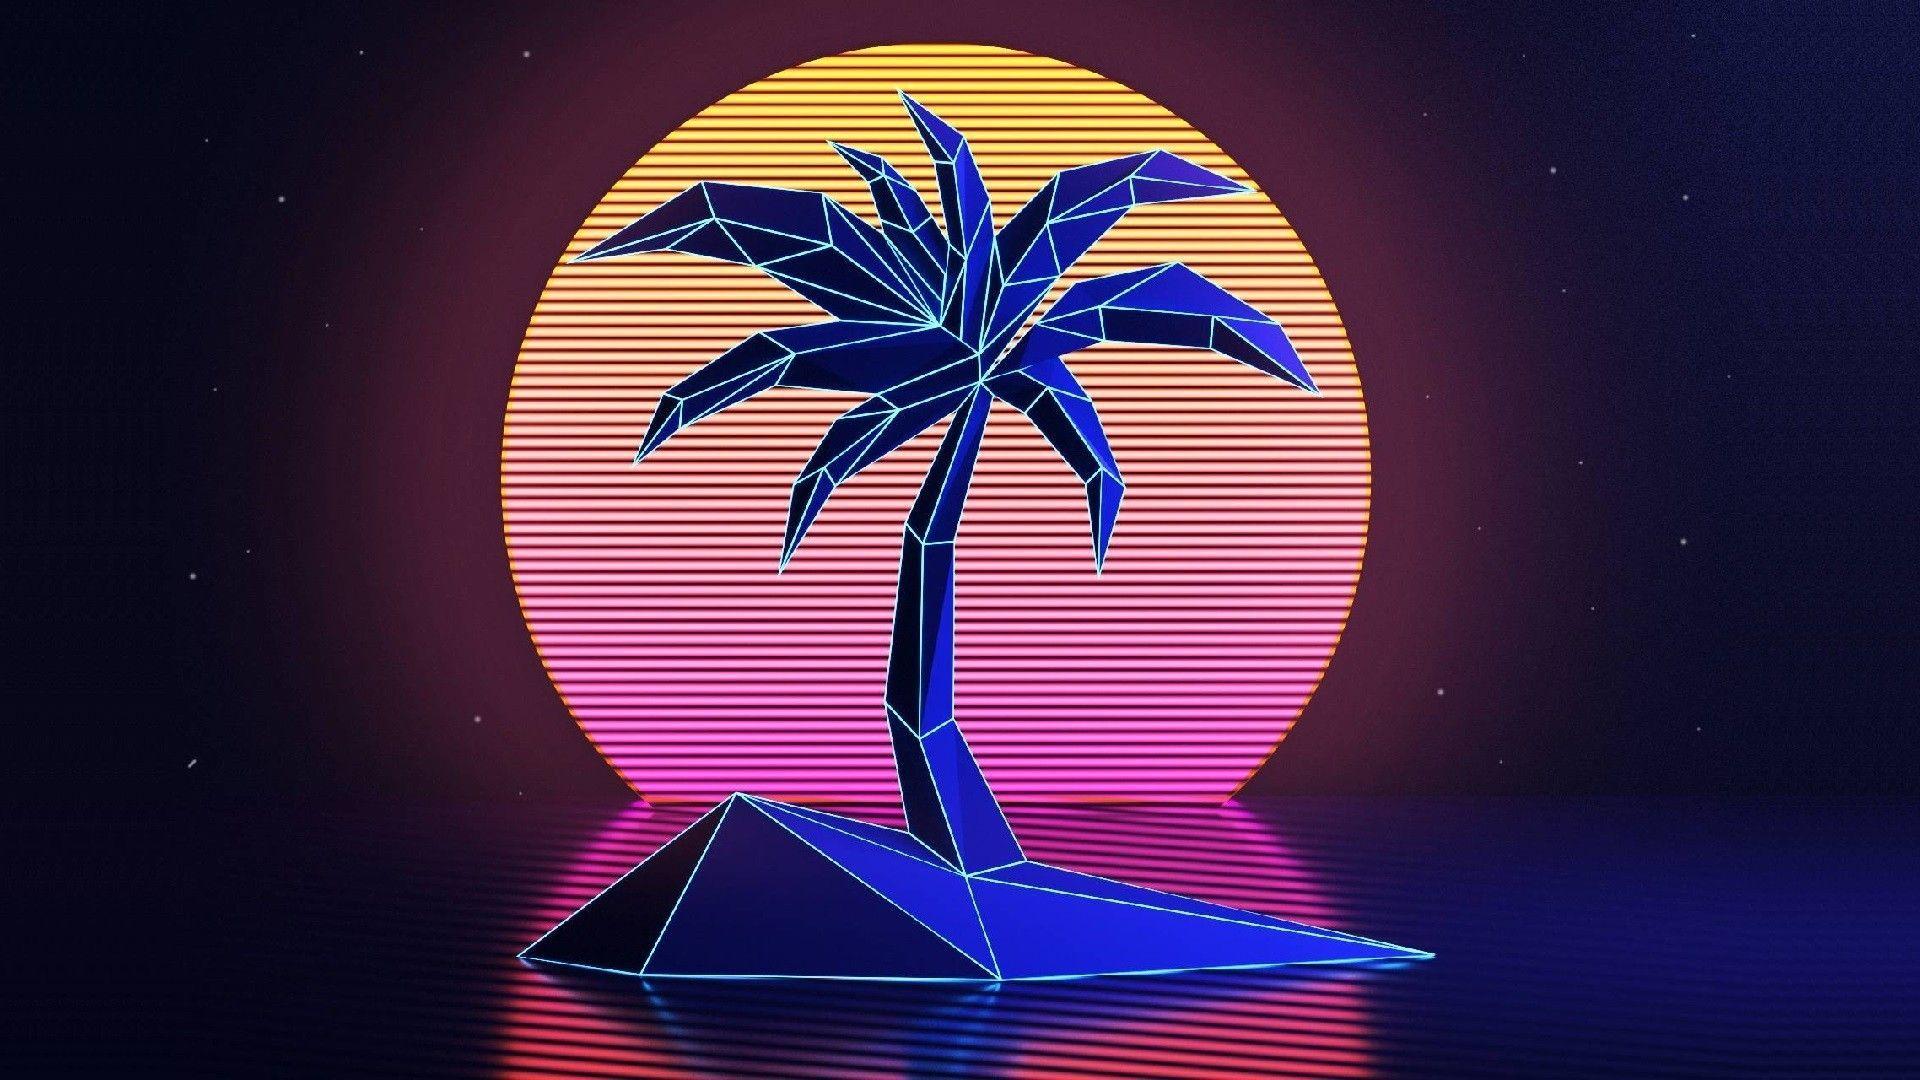 1920x1080 Vhs Palm Trees 1980s New Retro Wave Retro Style Vintage Sunset Neon Wallpaper Vaporwave Wallpaper Neon Backgrounds